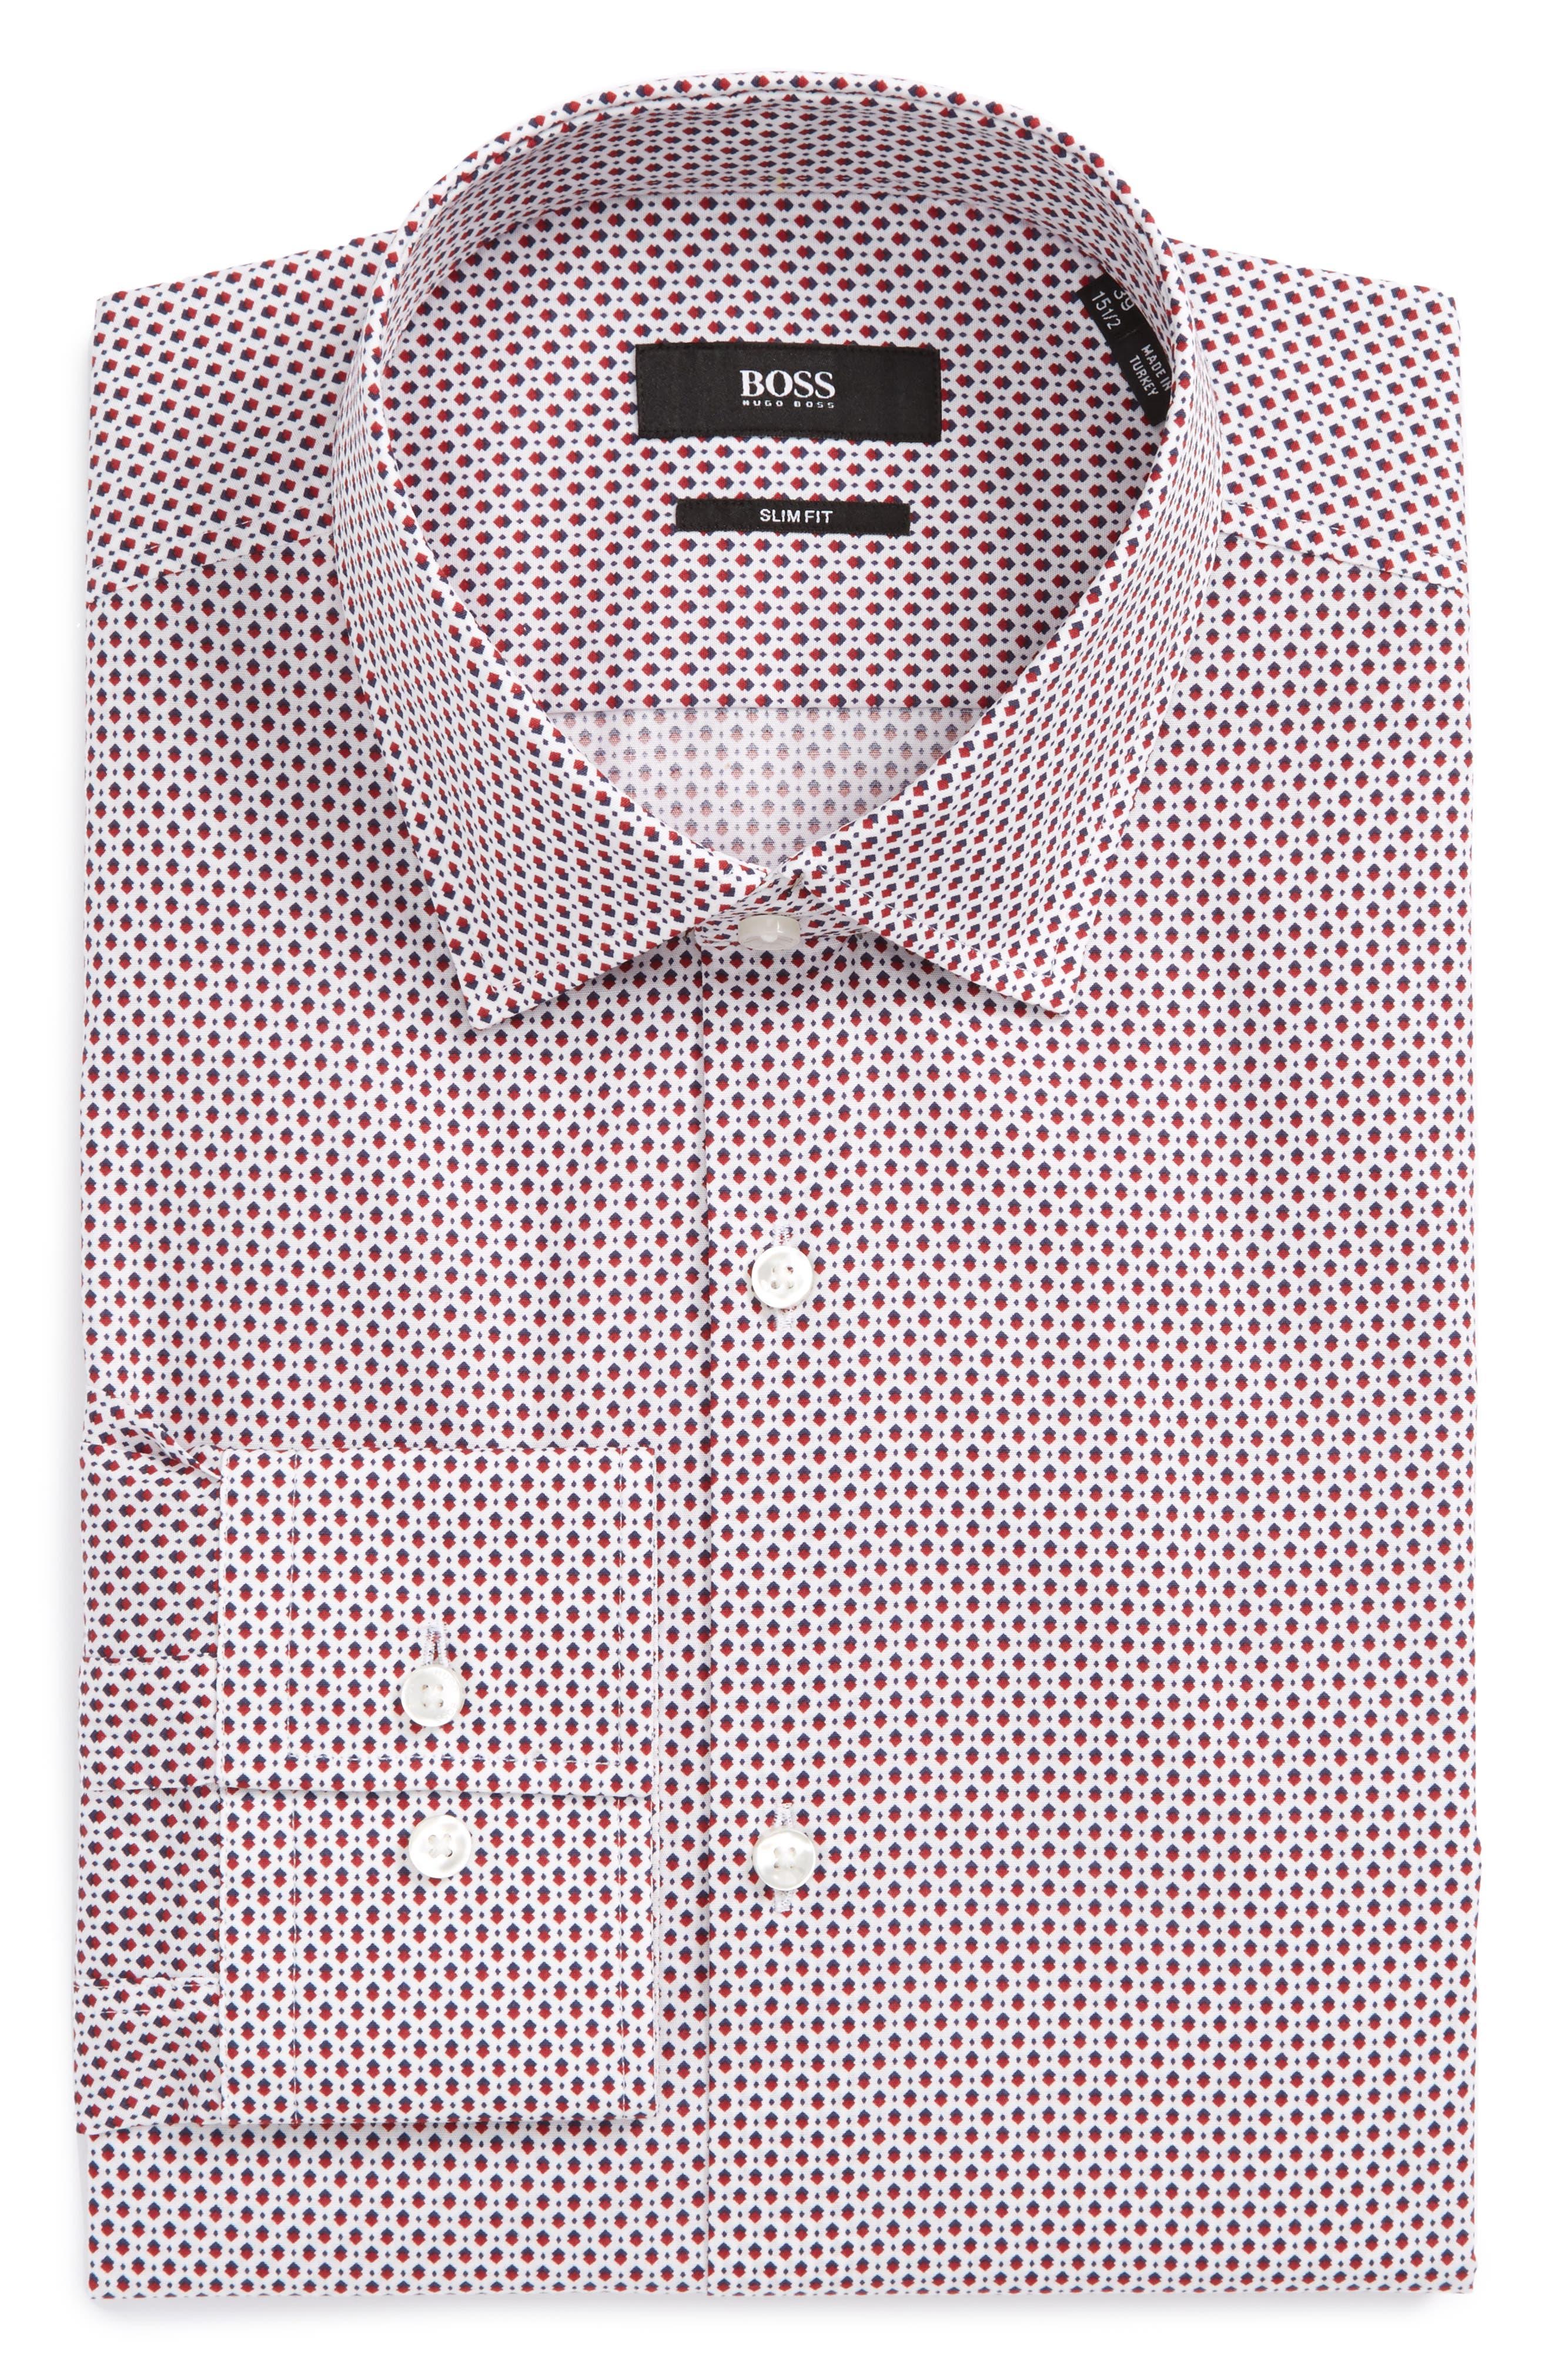 BOSS Jenno Slim Fit Print Dress Shirt